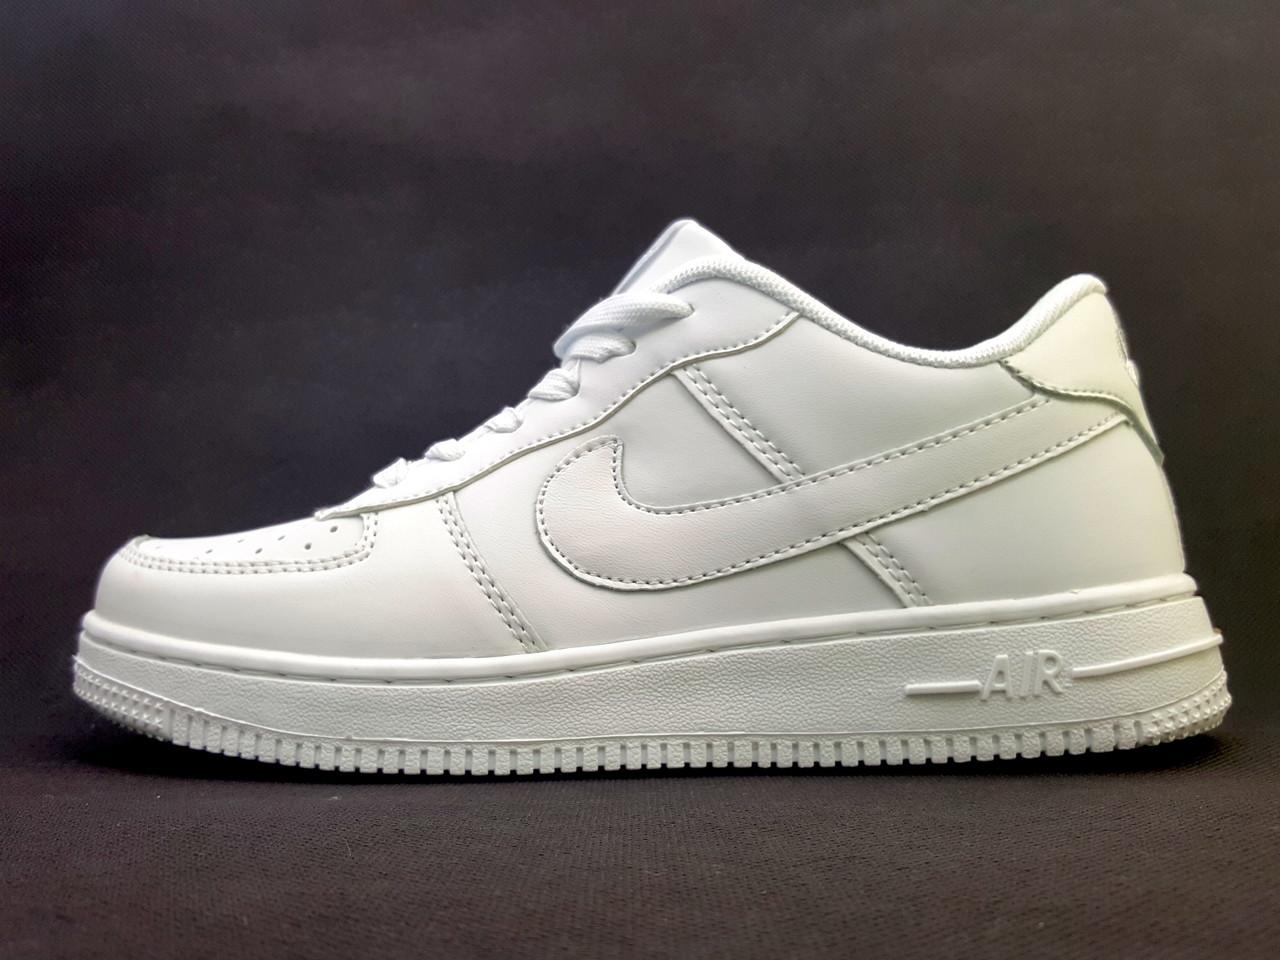 Кроссовки Найк Аир Форс Nike Air Force низкие, белые